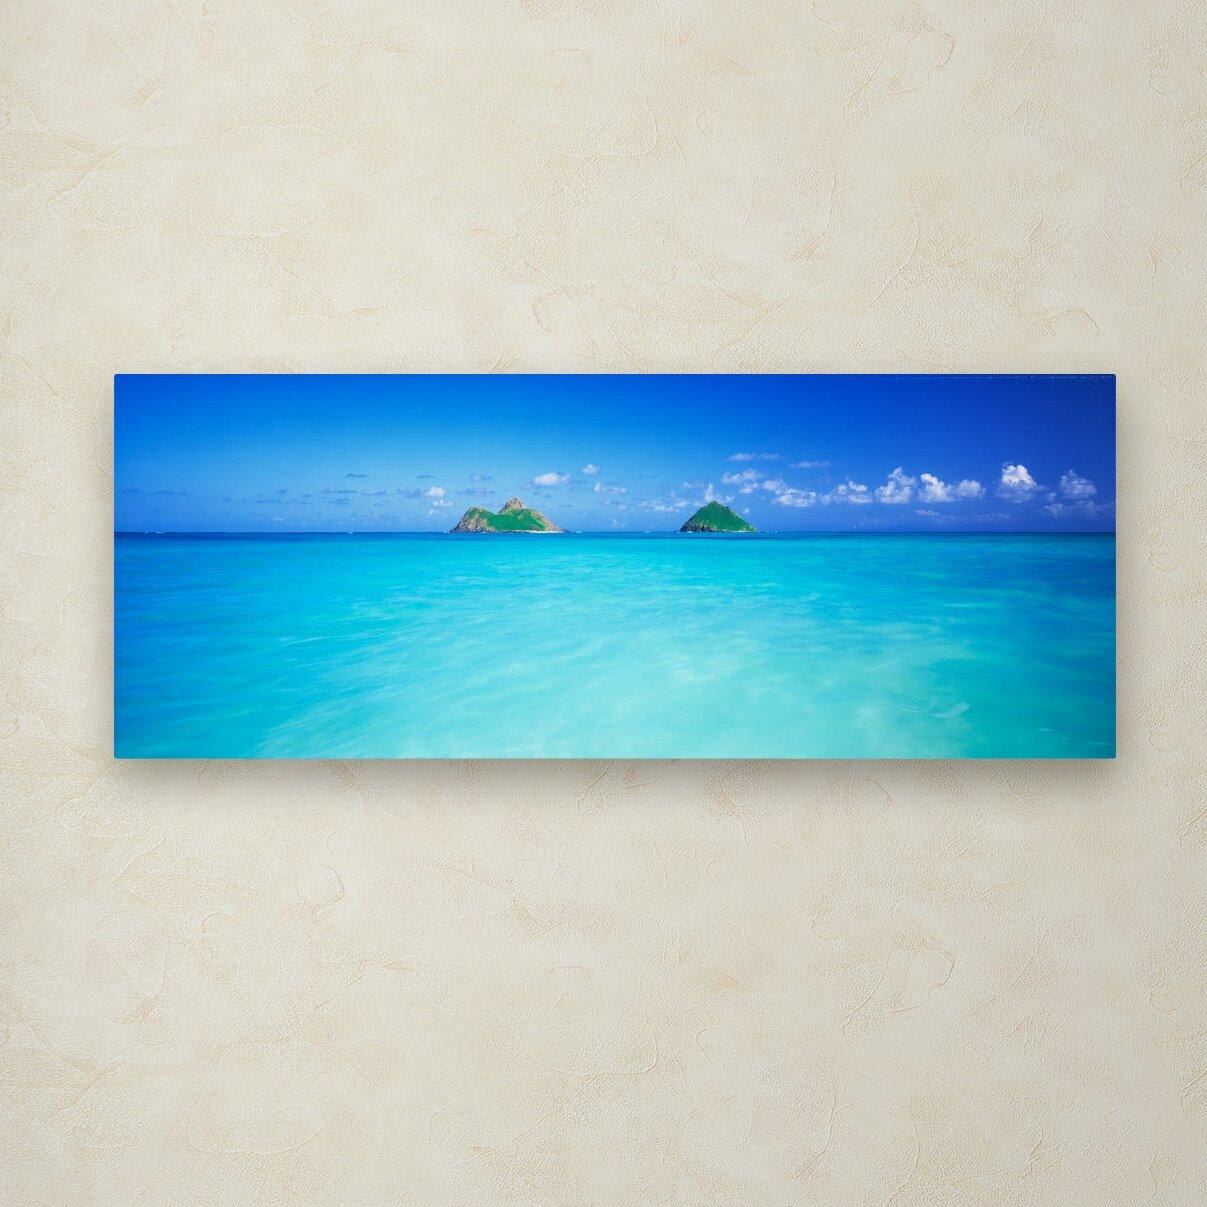 Trademark Art Quot Twin Islands Oahu Quot By David Evans